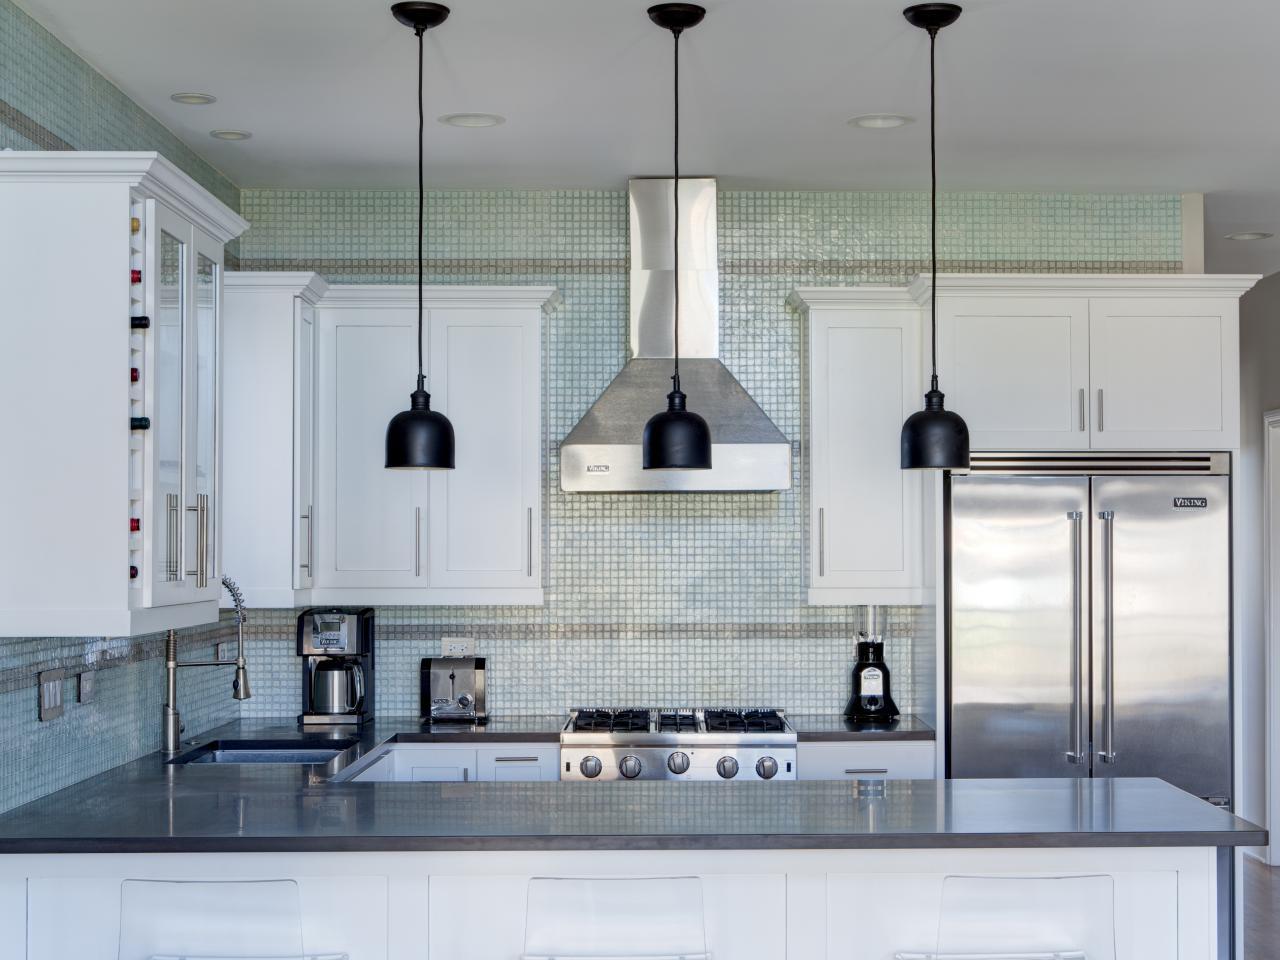 Tile Backsplash Ideas Pictures Amp Tips From Hgtv Kitchen